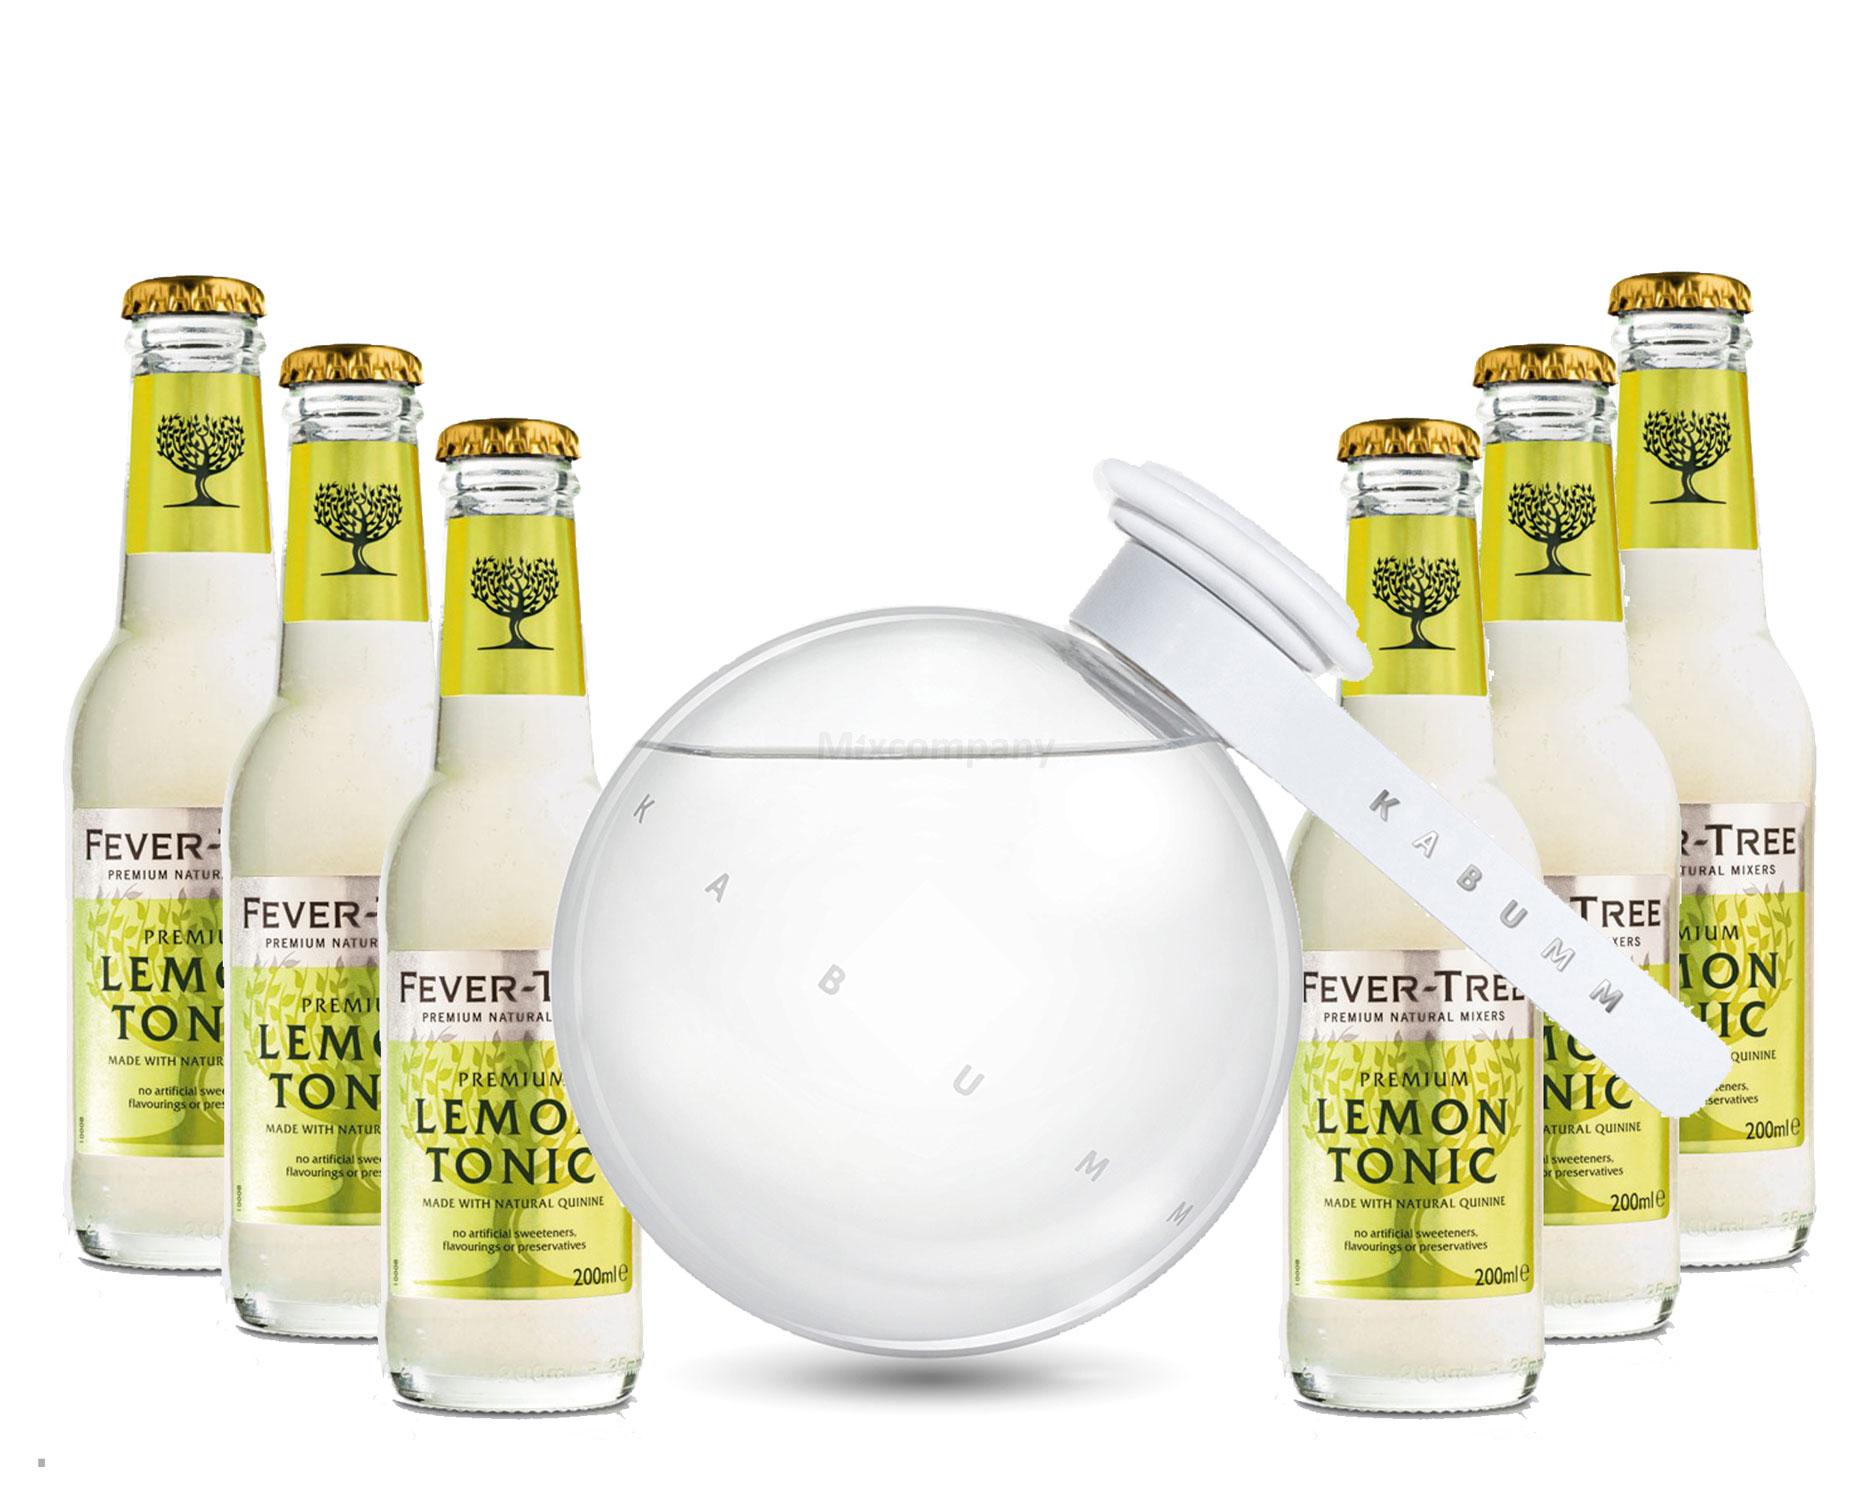 Vodka Lemon Set - Kabumm Vodka 0,7l 700ml (40% Vol) + 6x Fever Tree Lemon Tonic 200ml inkl. Pfand MEHRWEG